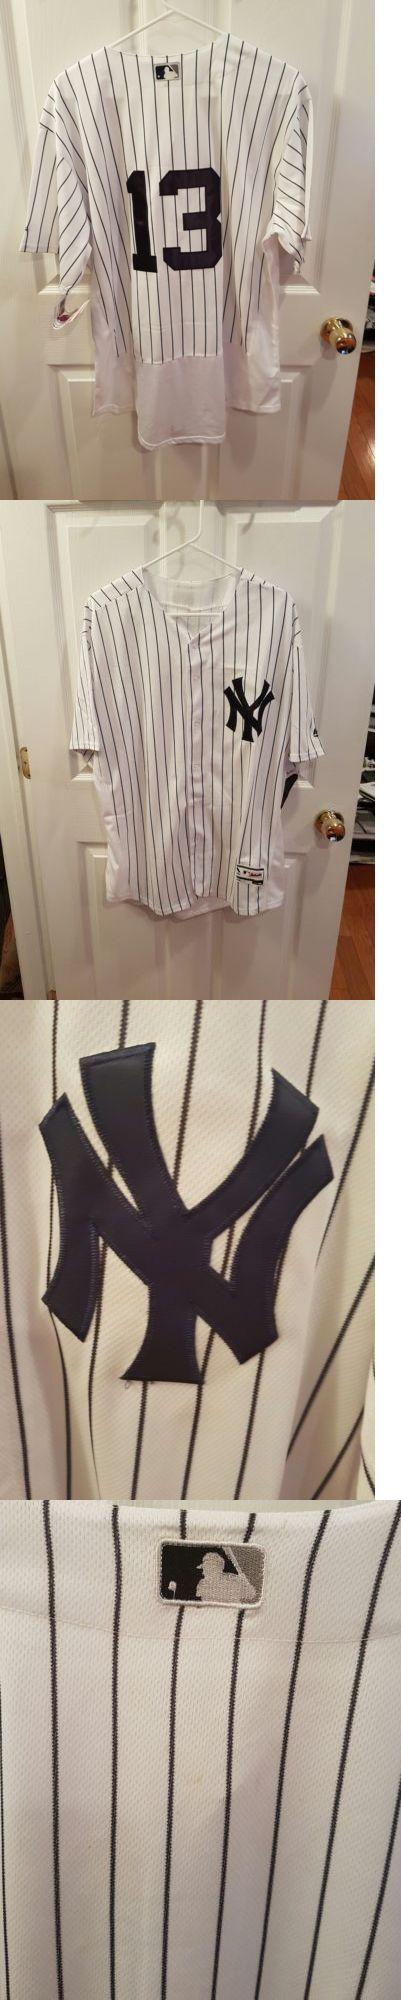 Baseball Shirts and Jerseys 181348: New York Yankees Alex Rodriguez #10 Pinstripes Extra Large Flexbase -> BUY IT NOW ONLY: $55 on eBay!